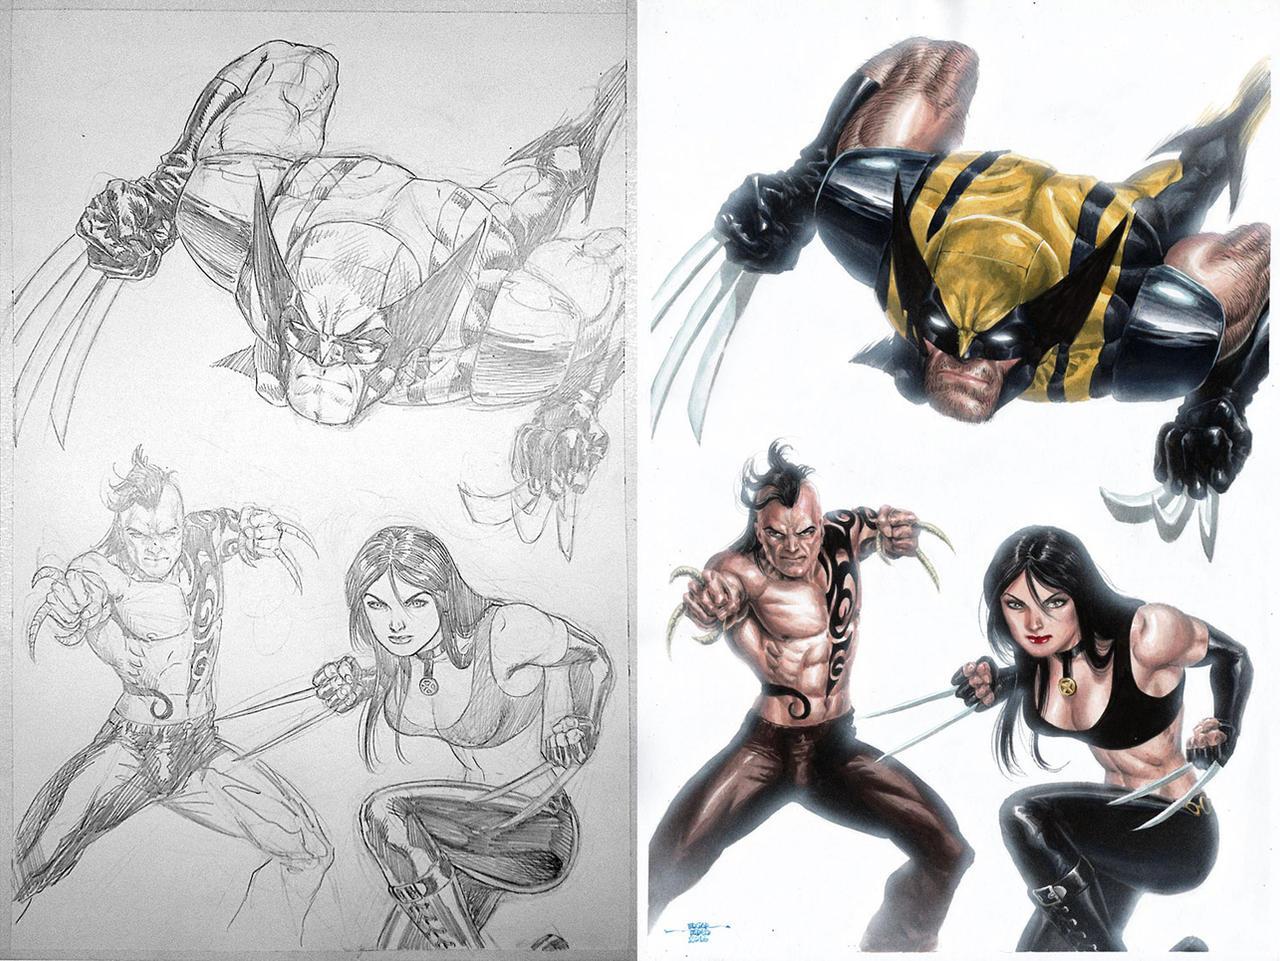 Wolverine, X-23, Daken - Pencil, Watercolors